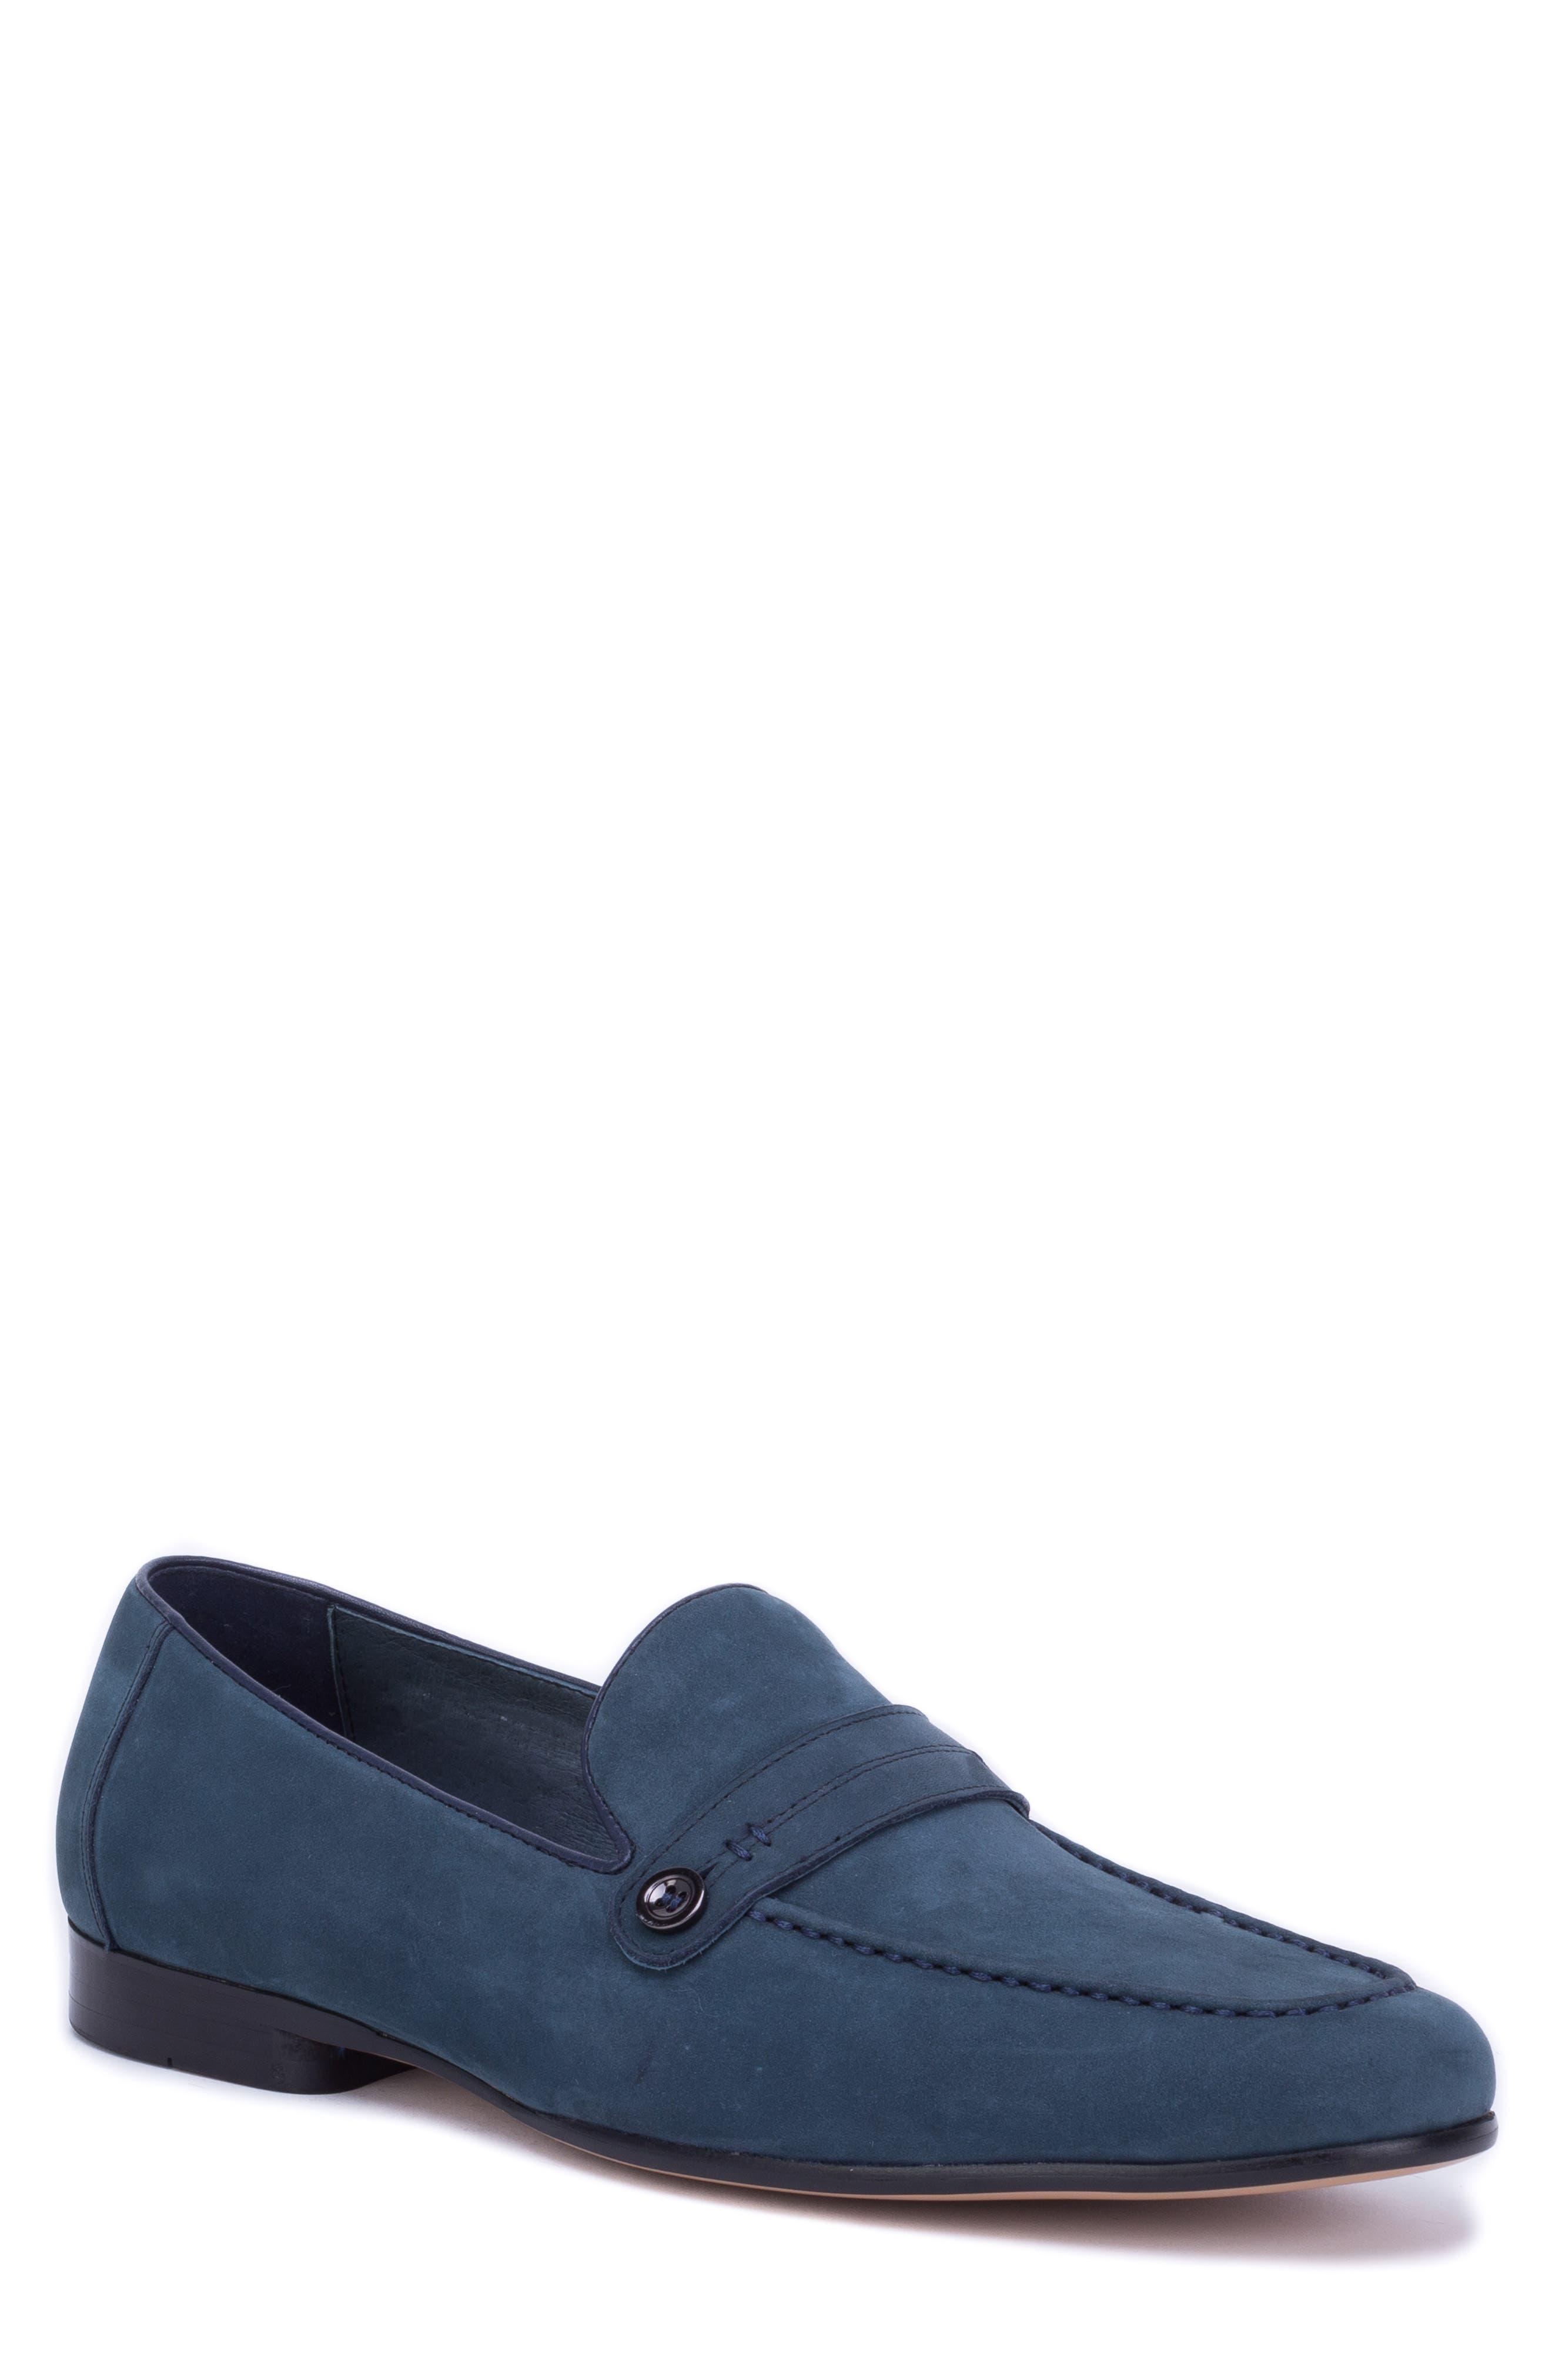 Robert Graham Norris Button Loafer- Blue